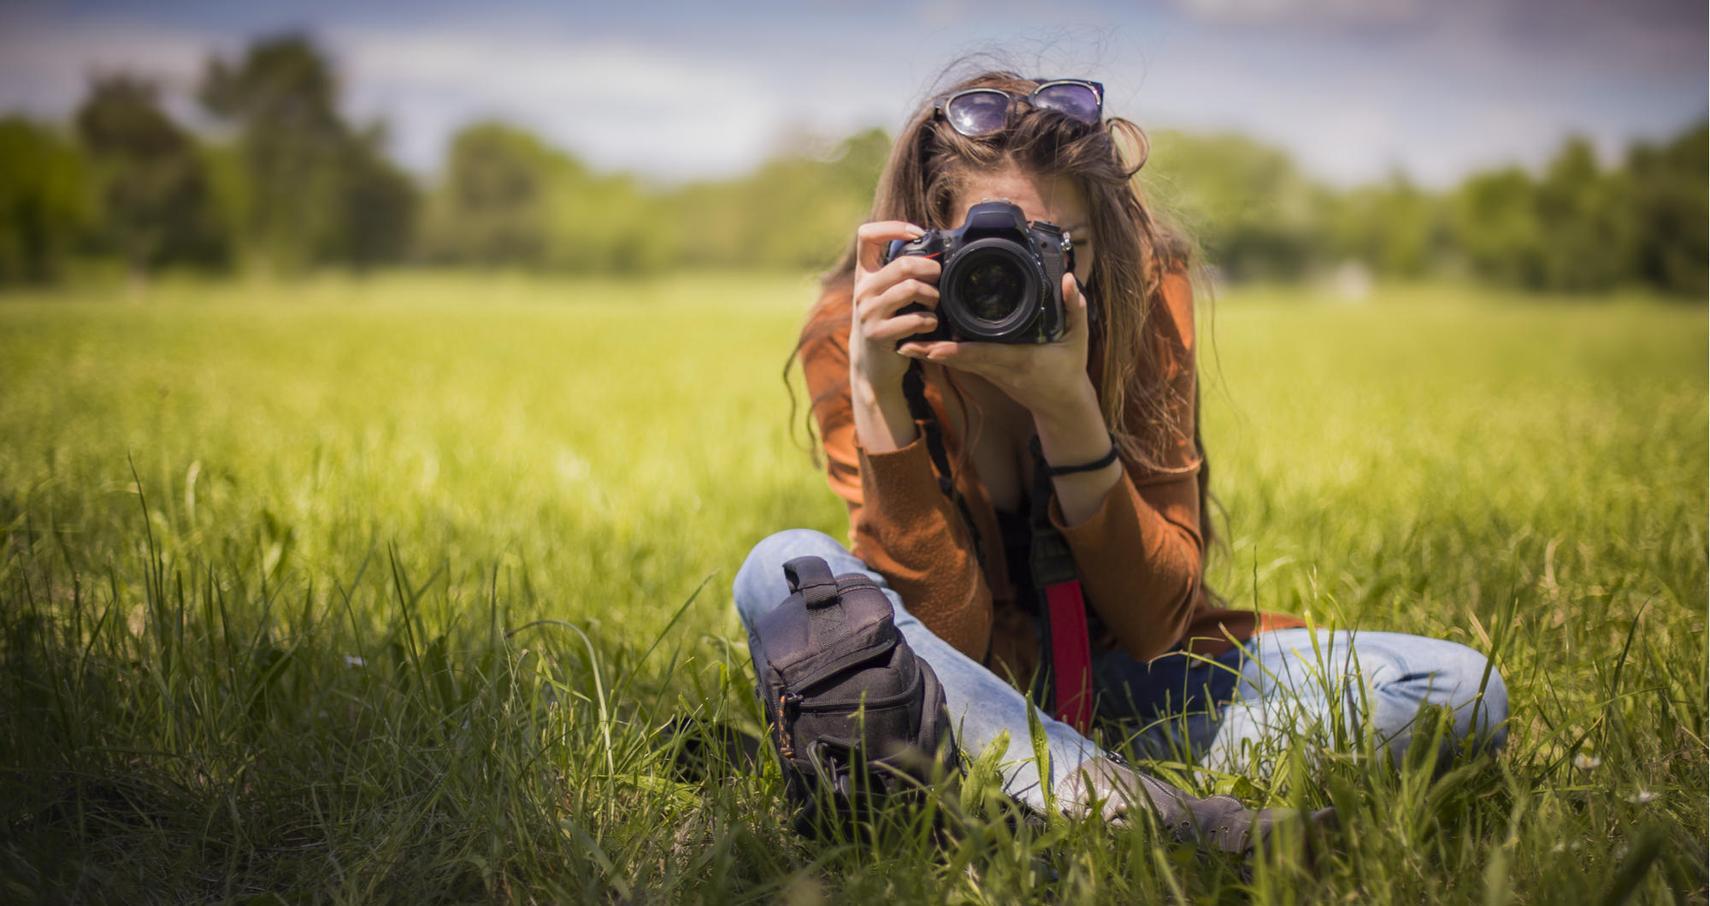 10 Women Photographers Whose Work You Should Be Following